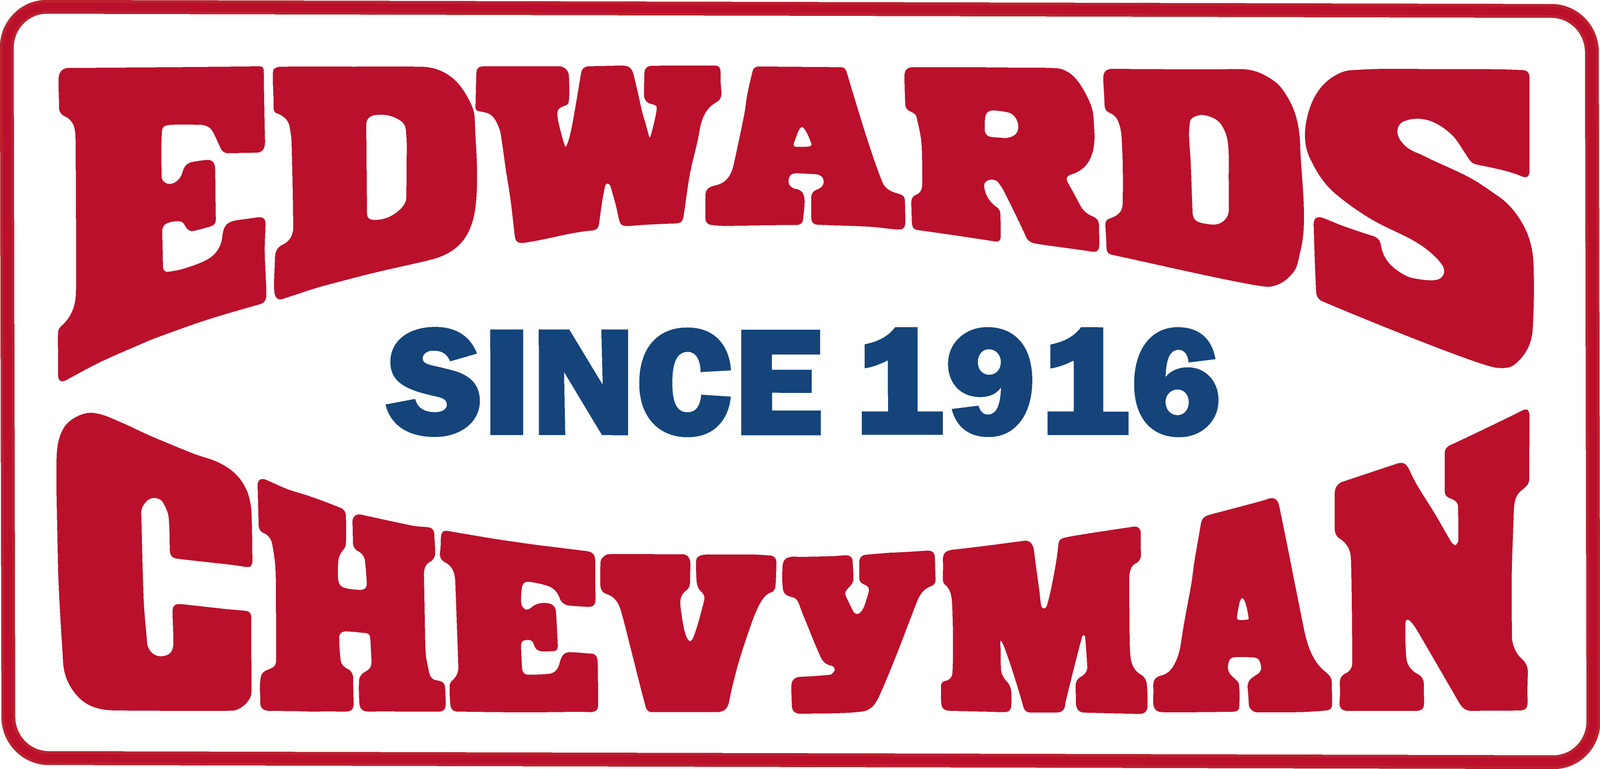 Edwards Chevrolet Co Inc Birmingham AL Read